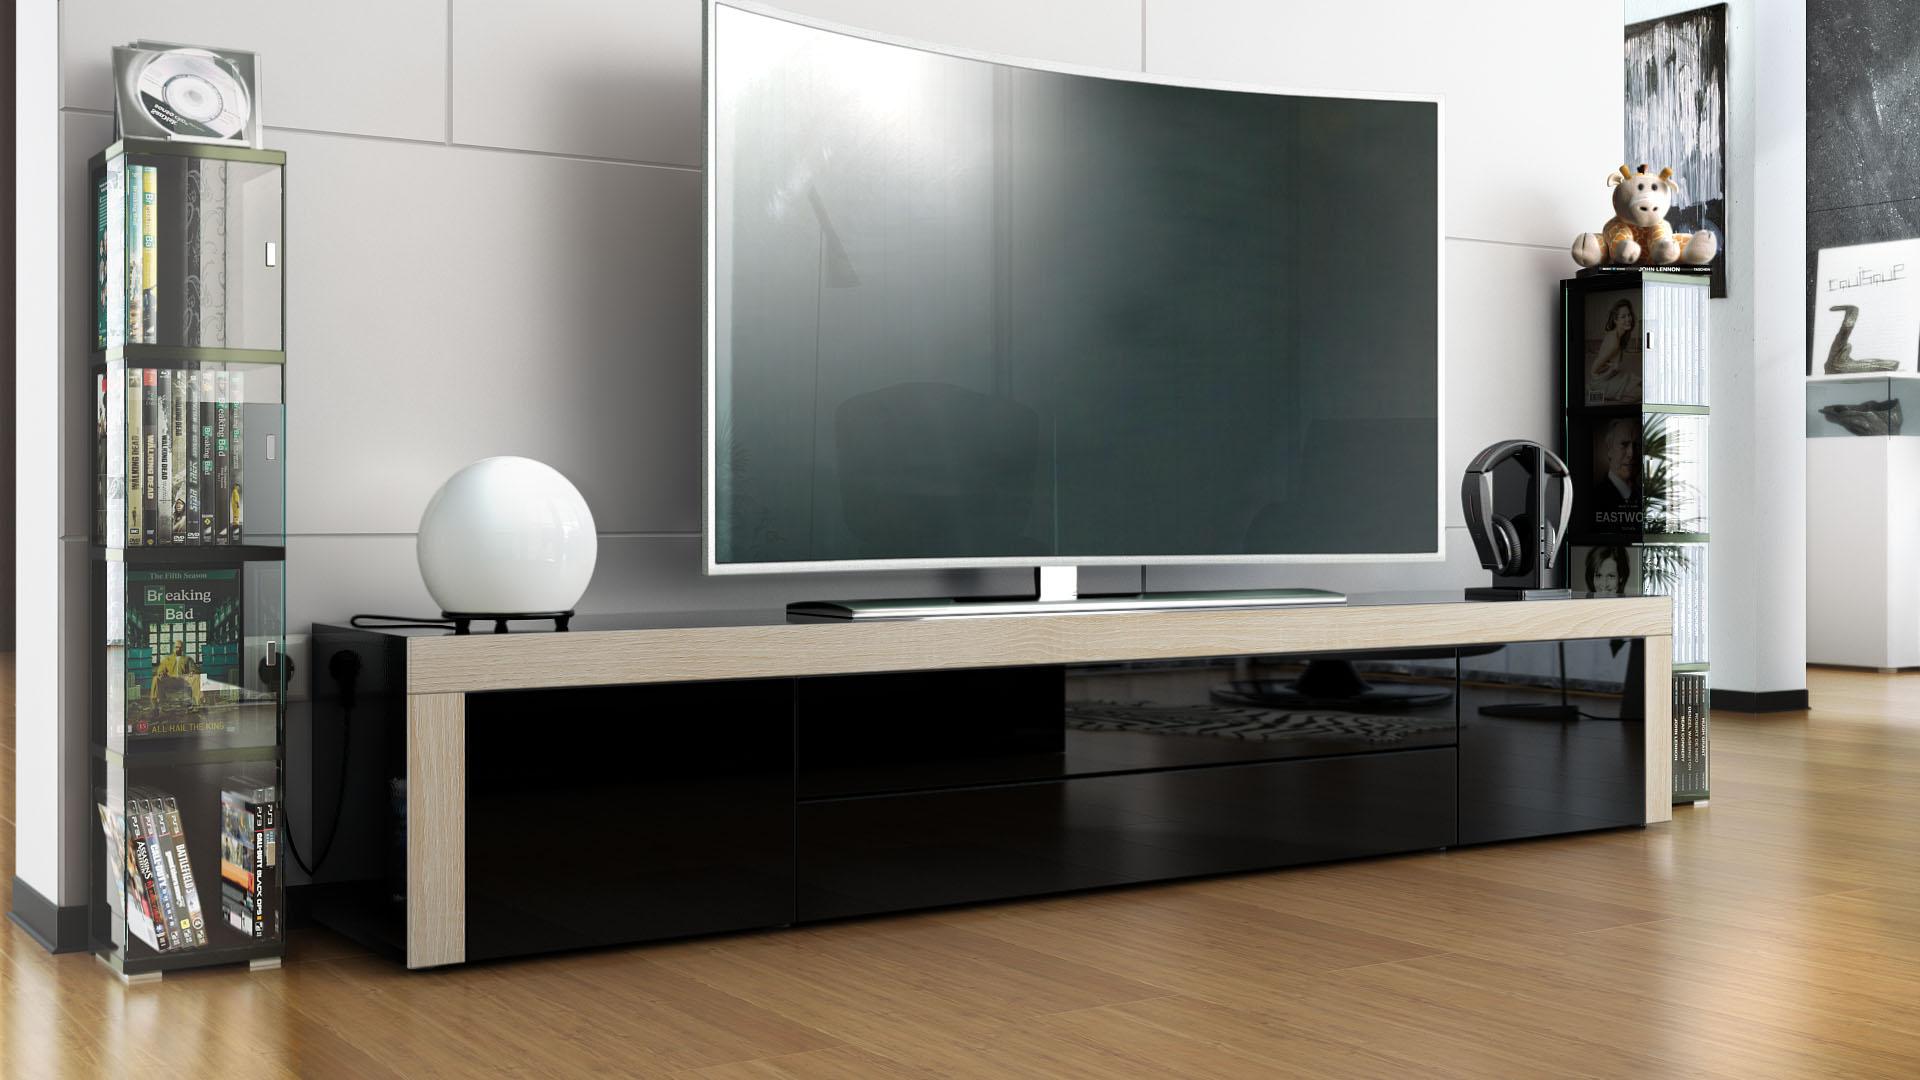 tv stand board unit lowboard cabinet la paz black high gloss natural tones. Black Bedroom Furniture Sets. Home Design Ideas